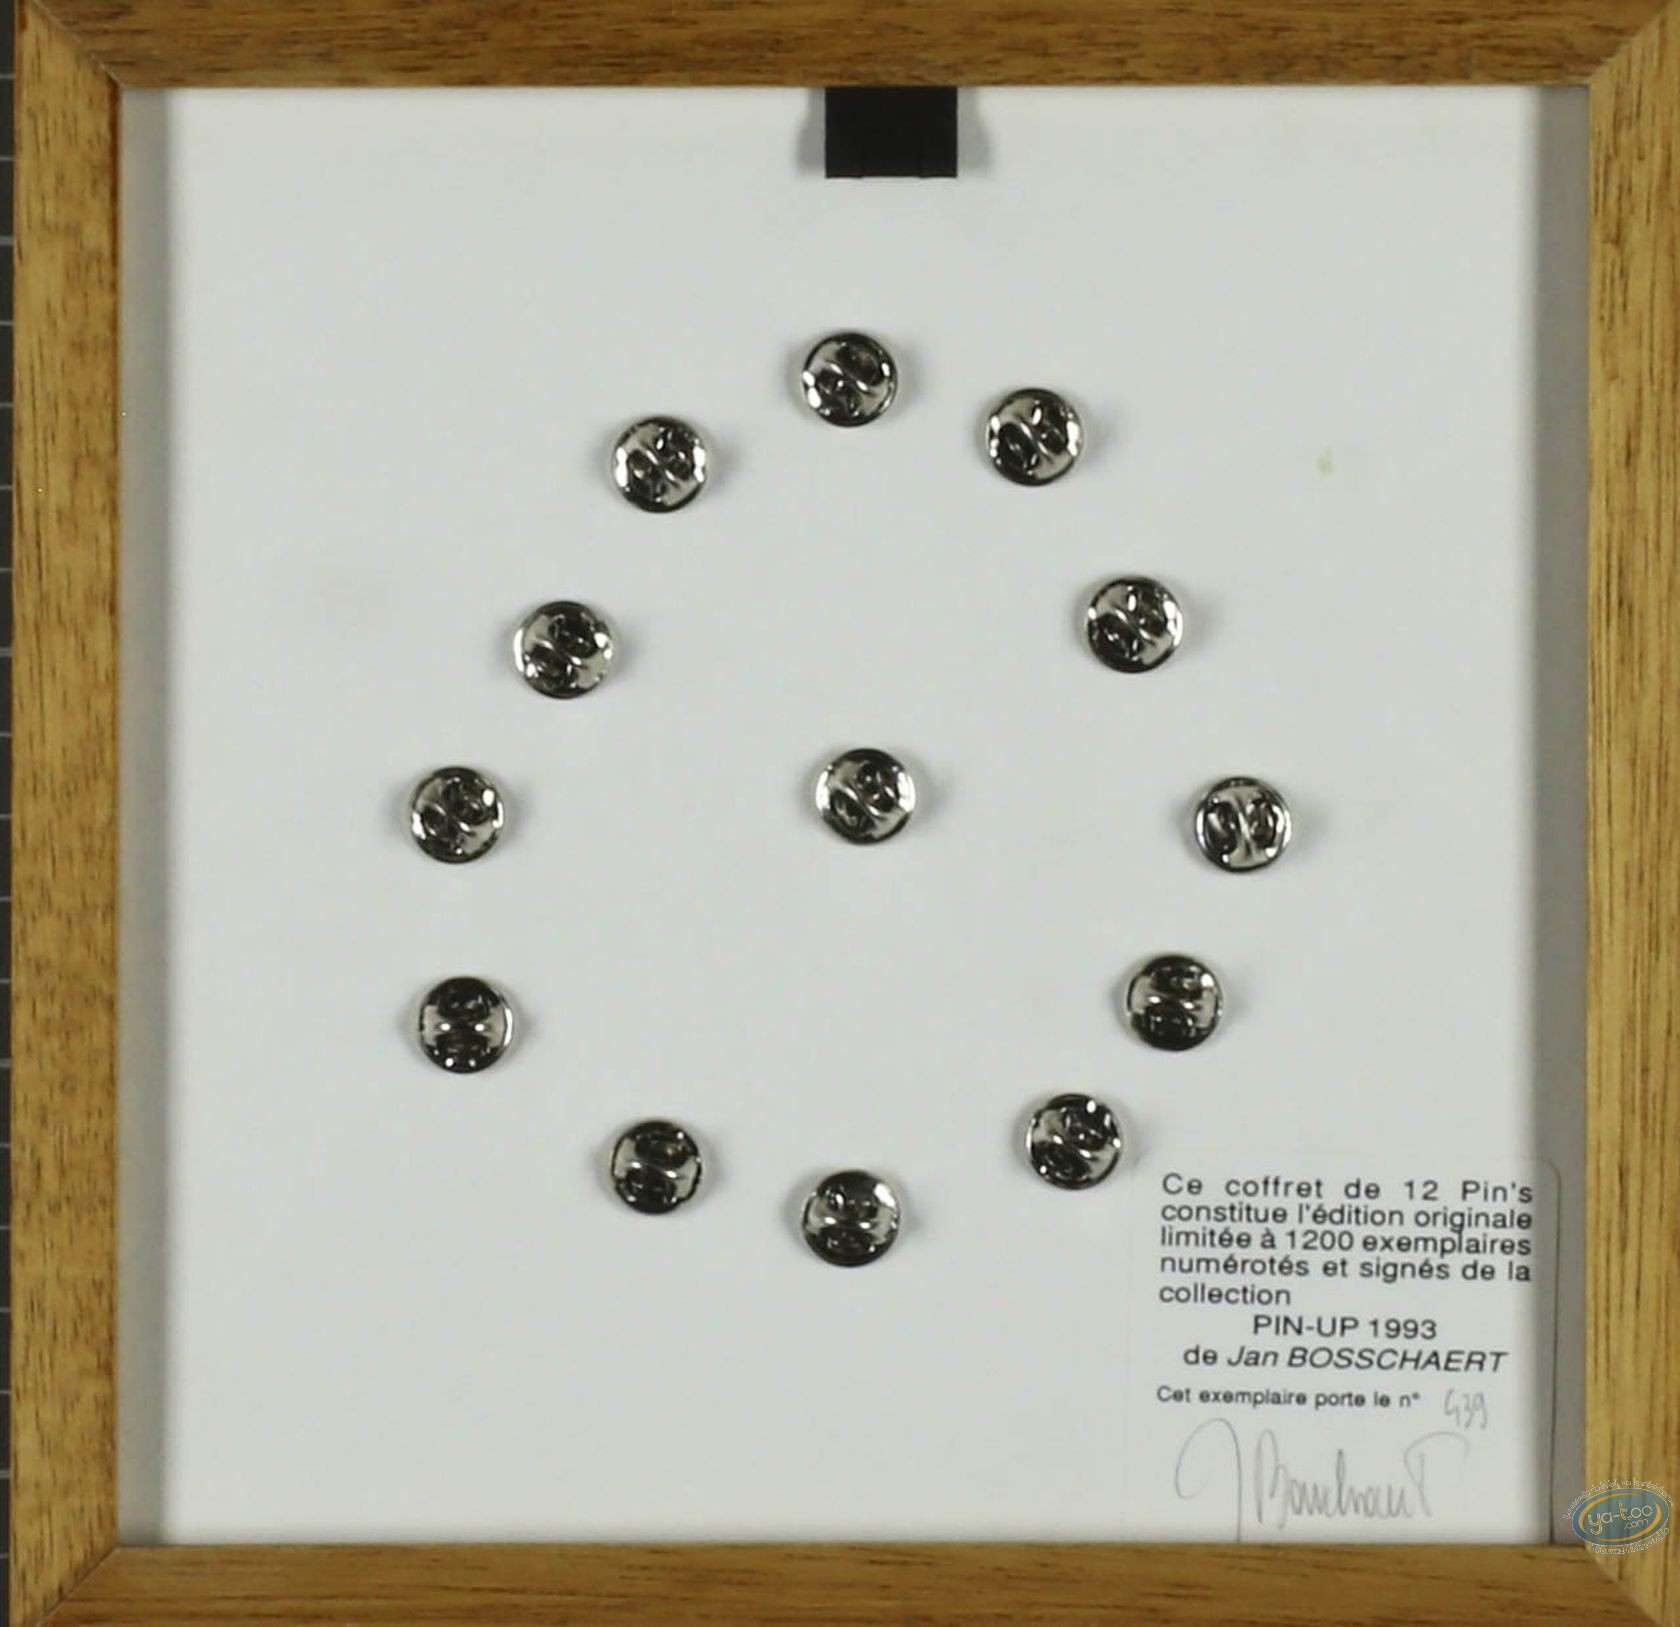 Pin's, Pin-Up : Frame, assortment pins 1993